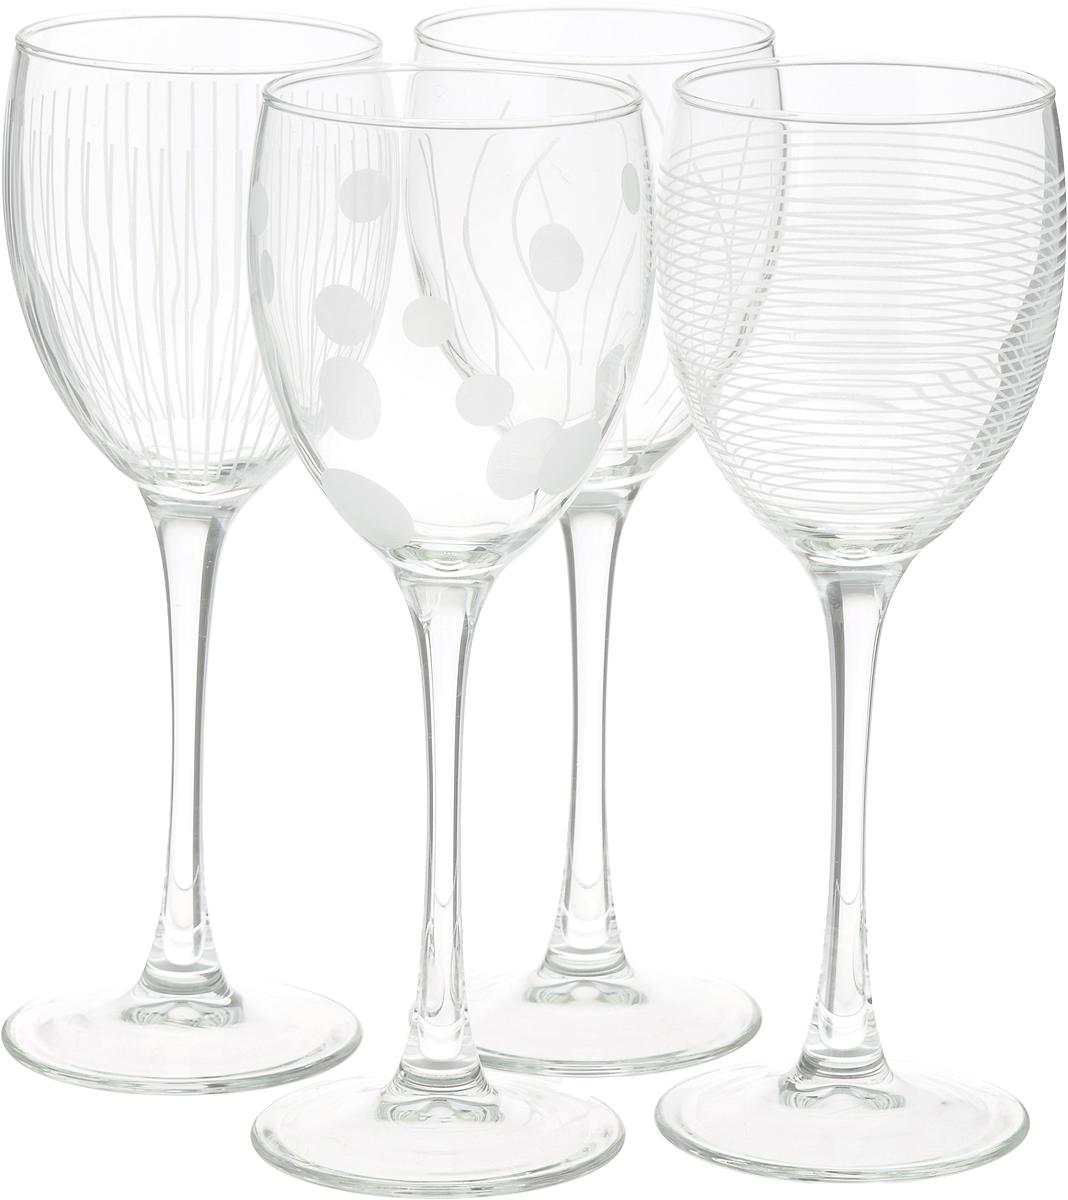 Набор фужеров для вина ОСЗ Лаунж Клаб, 250 мл, 4 шт набор стопок luminarc лаунж клаб 4шт 50мл стекло